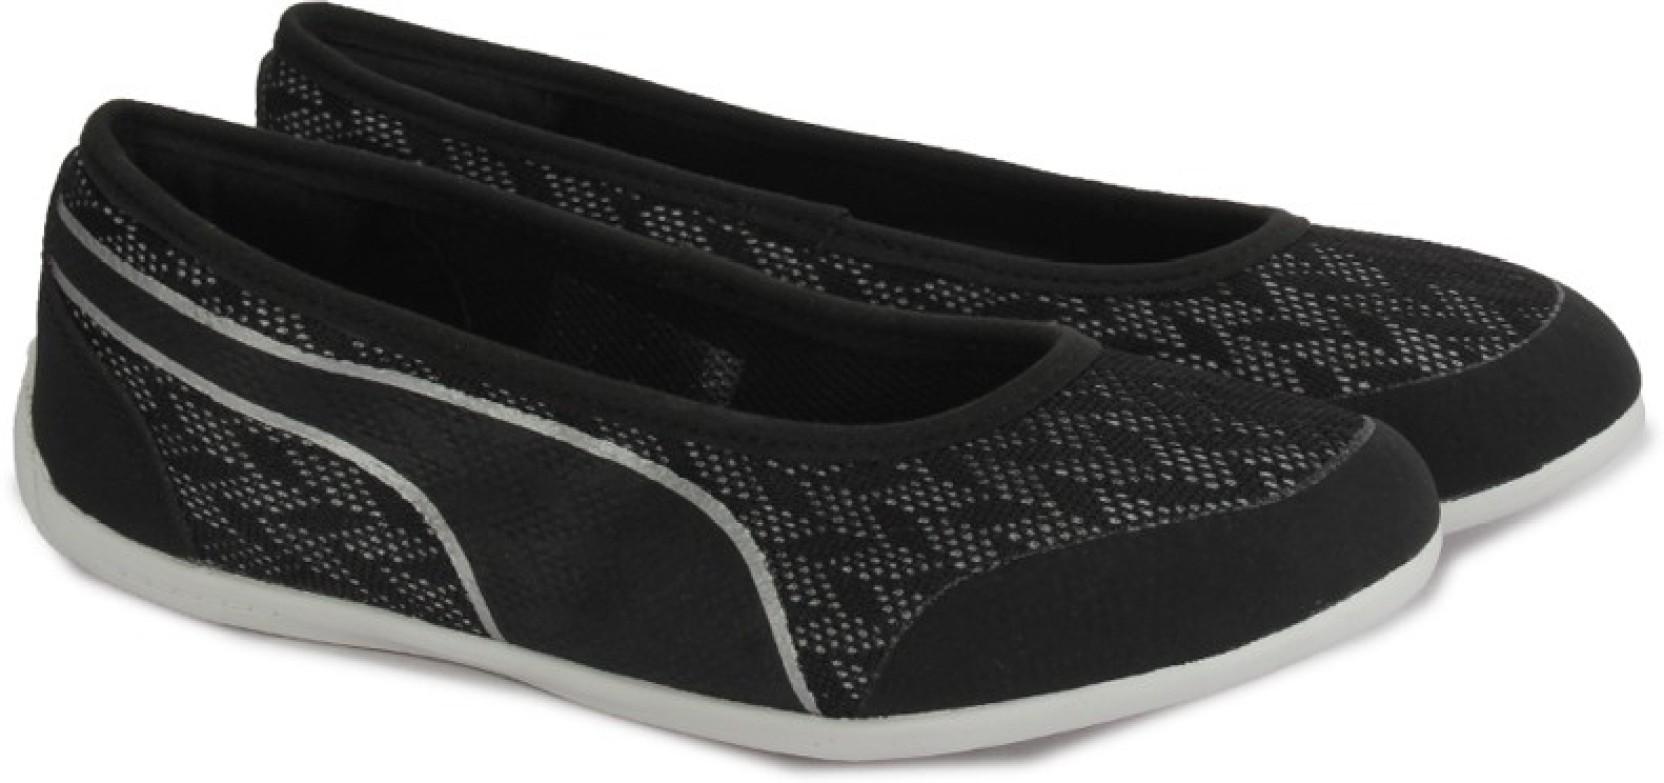 e483effbd05 Puma Modern Soleil Ballerina MU IDP Casual Shoes For Women - Buy ...